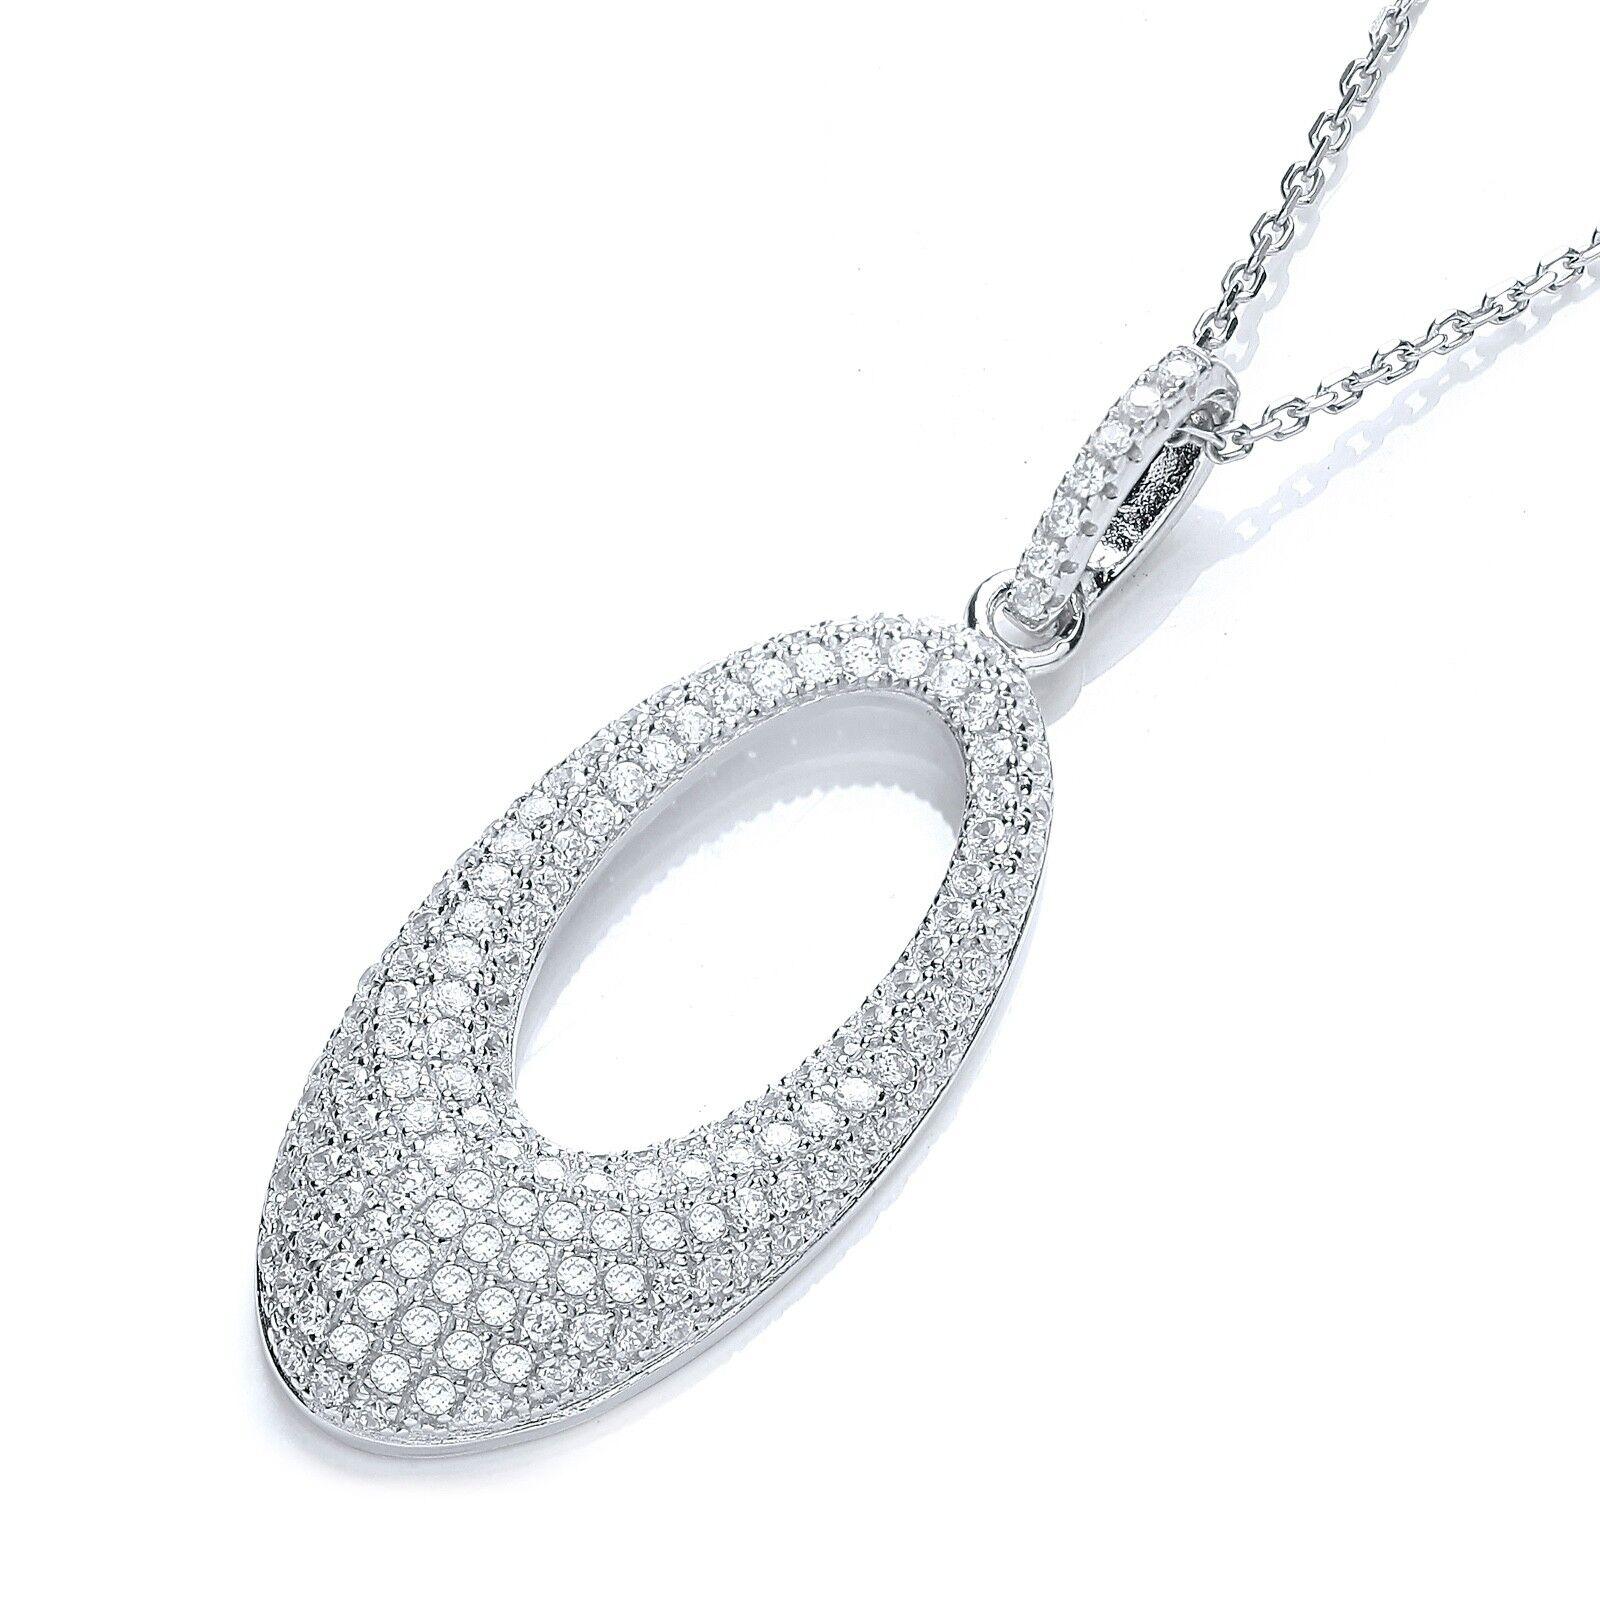 J Jaz Helena silver Forma Ovale Zirconi Ciondolo Collana